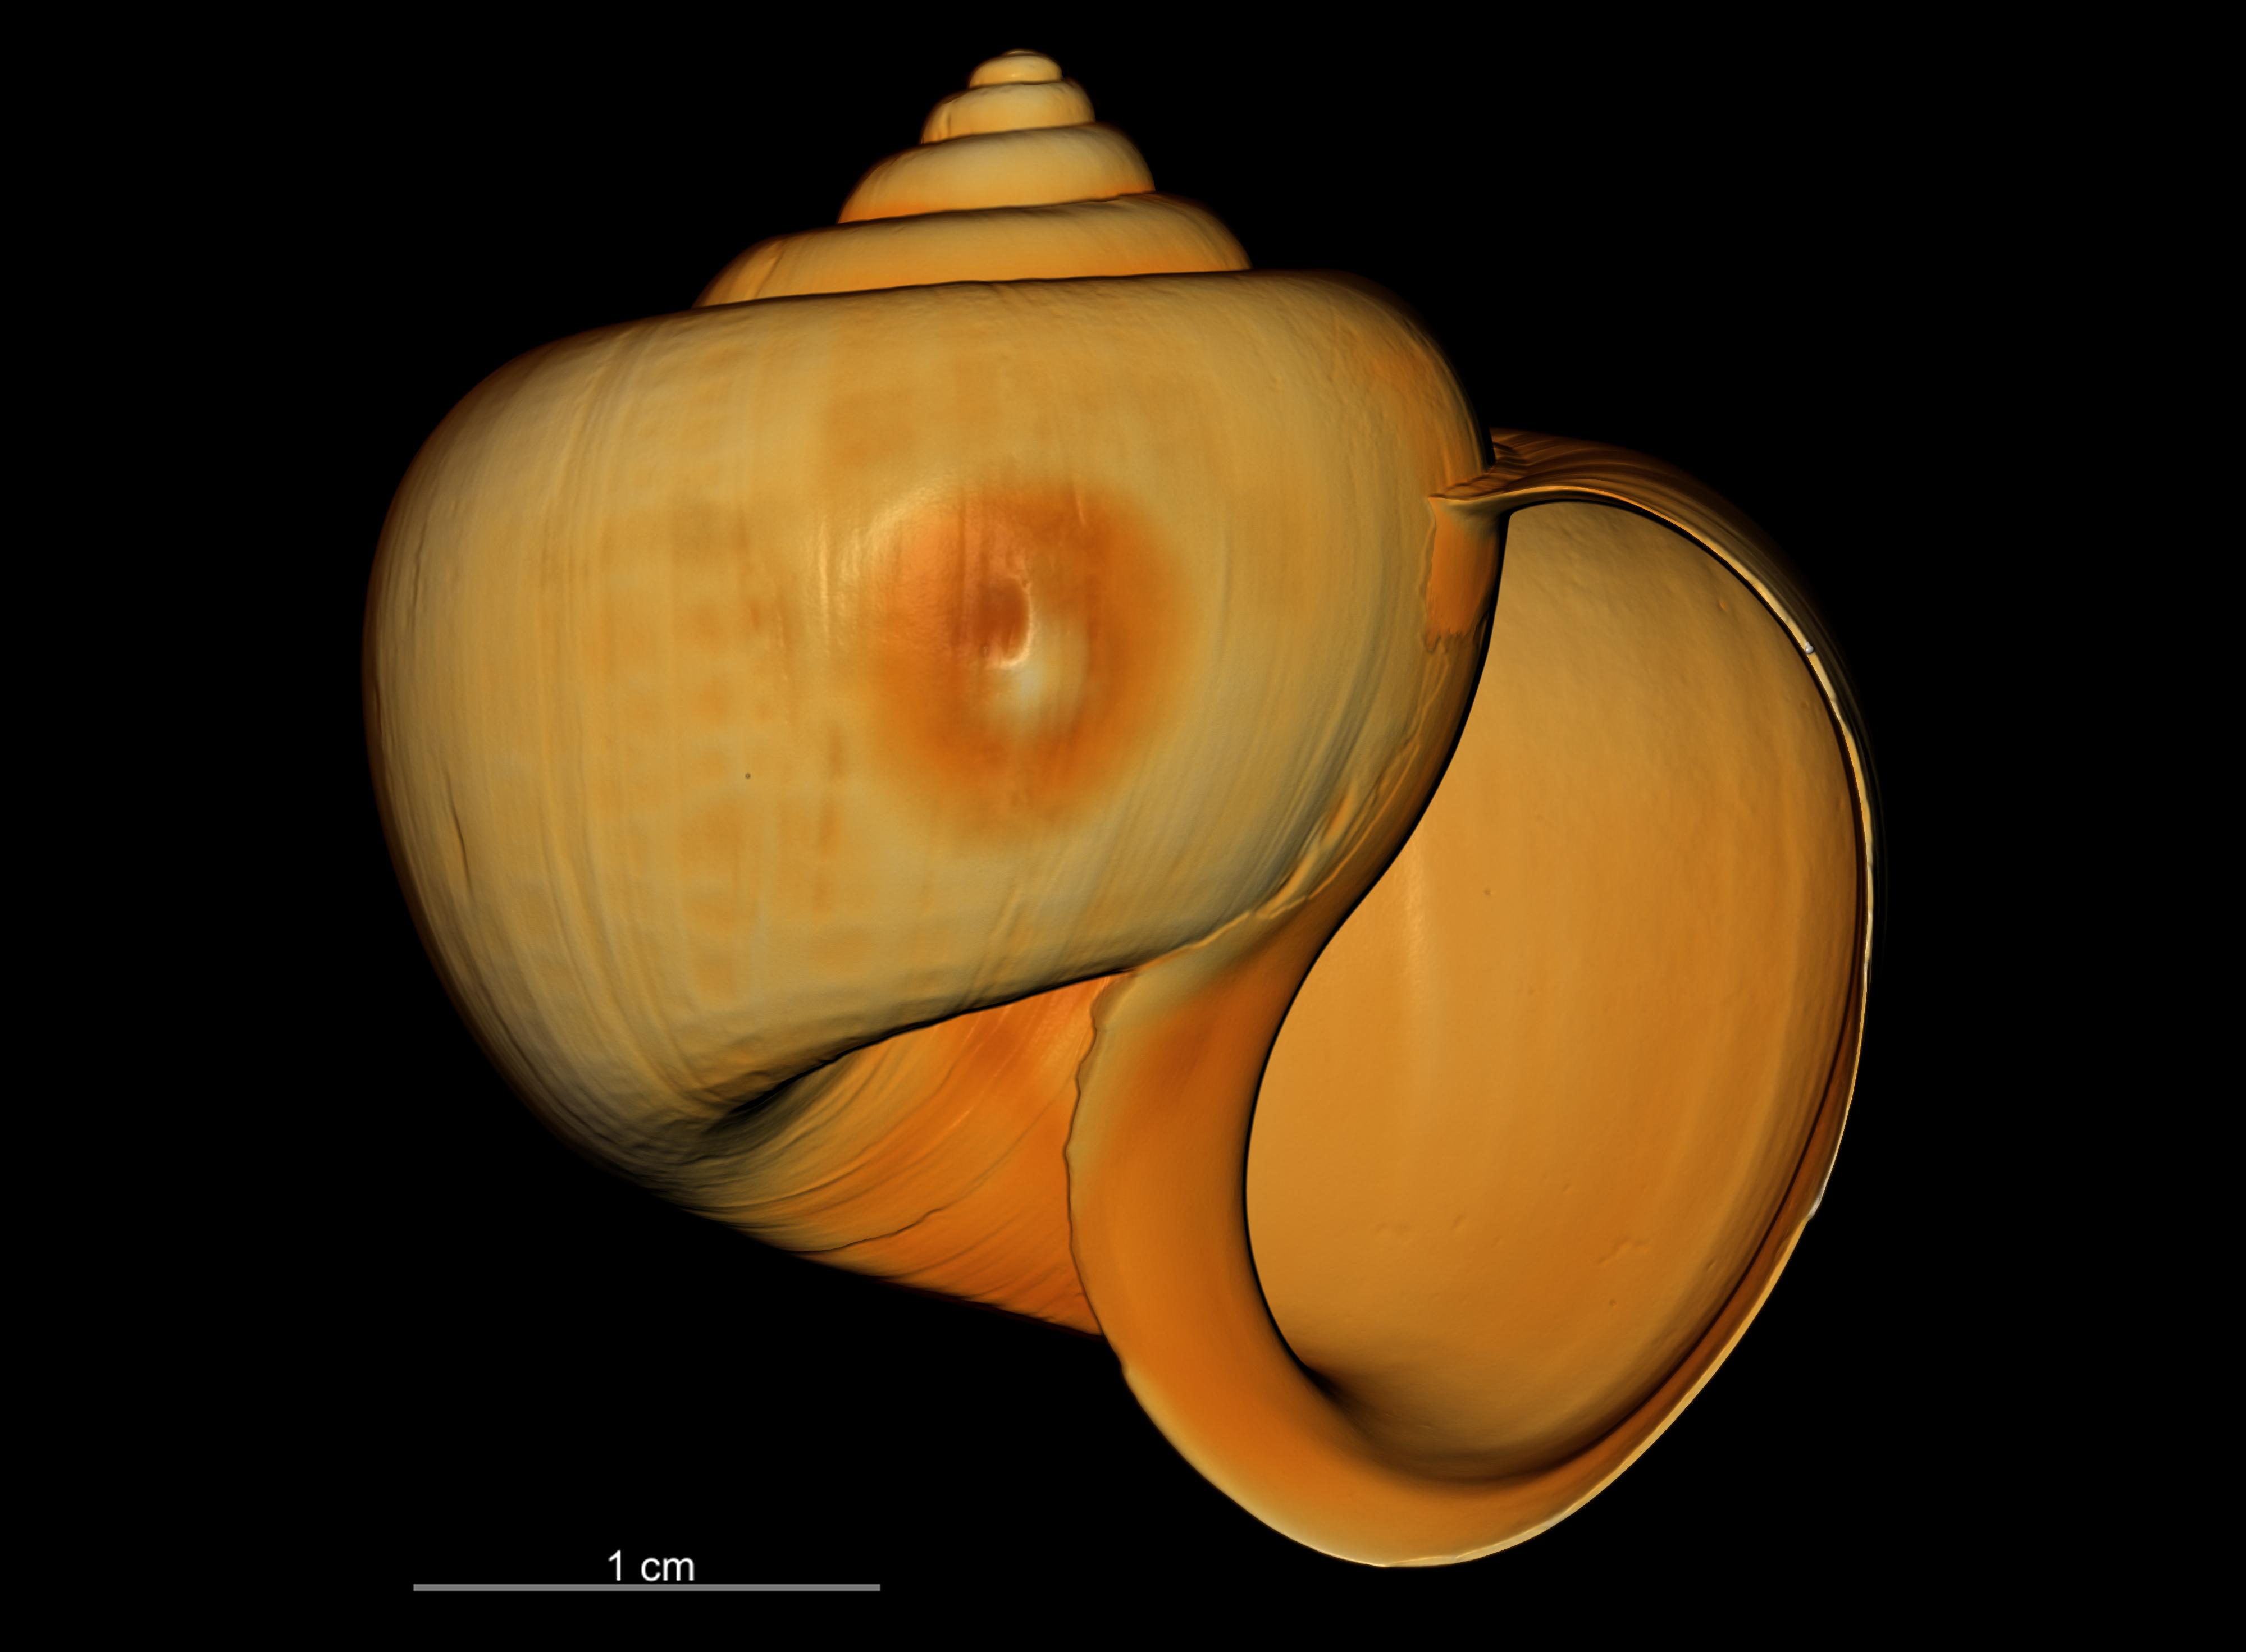 BE-RBINS-MT-3849-Ampullaria-puntaplaya-bulk-Spec1-ORAL-MCT-RX.jpg